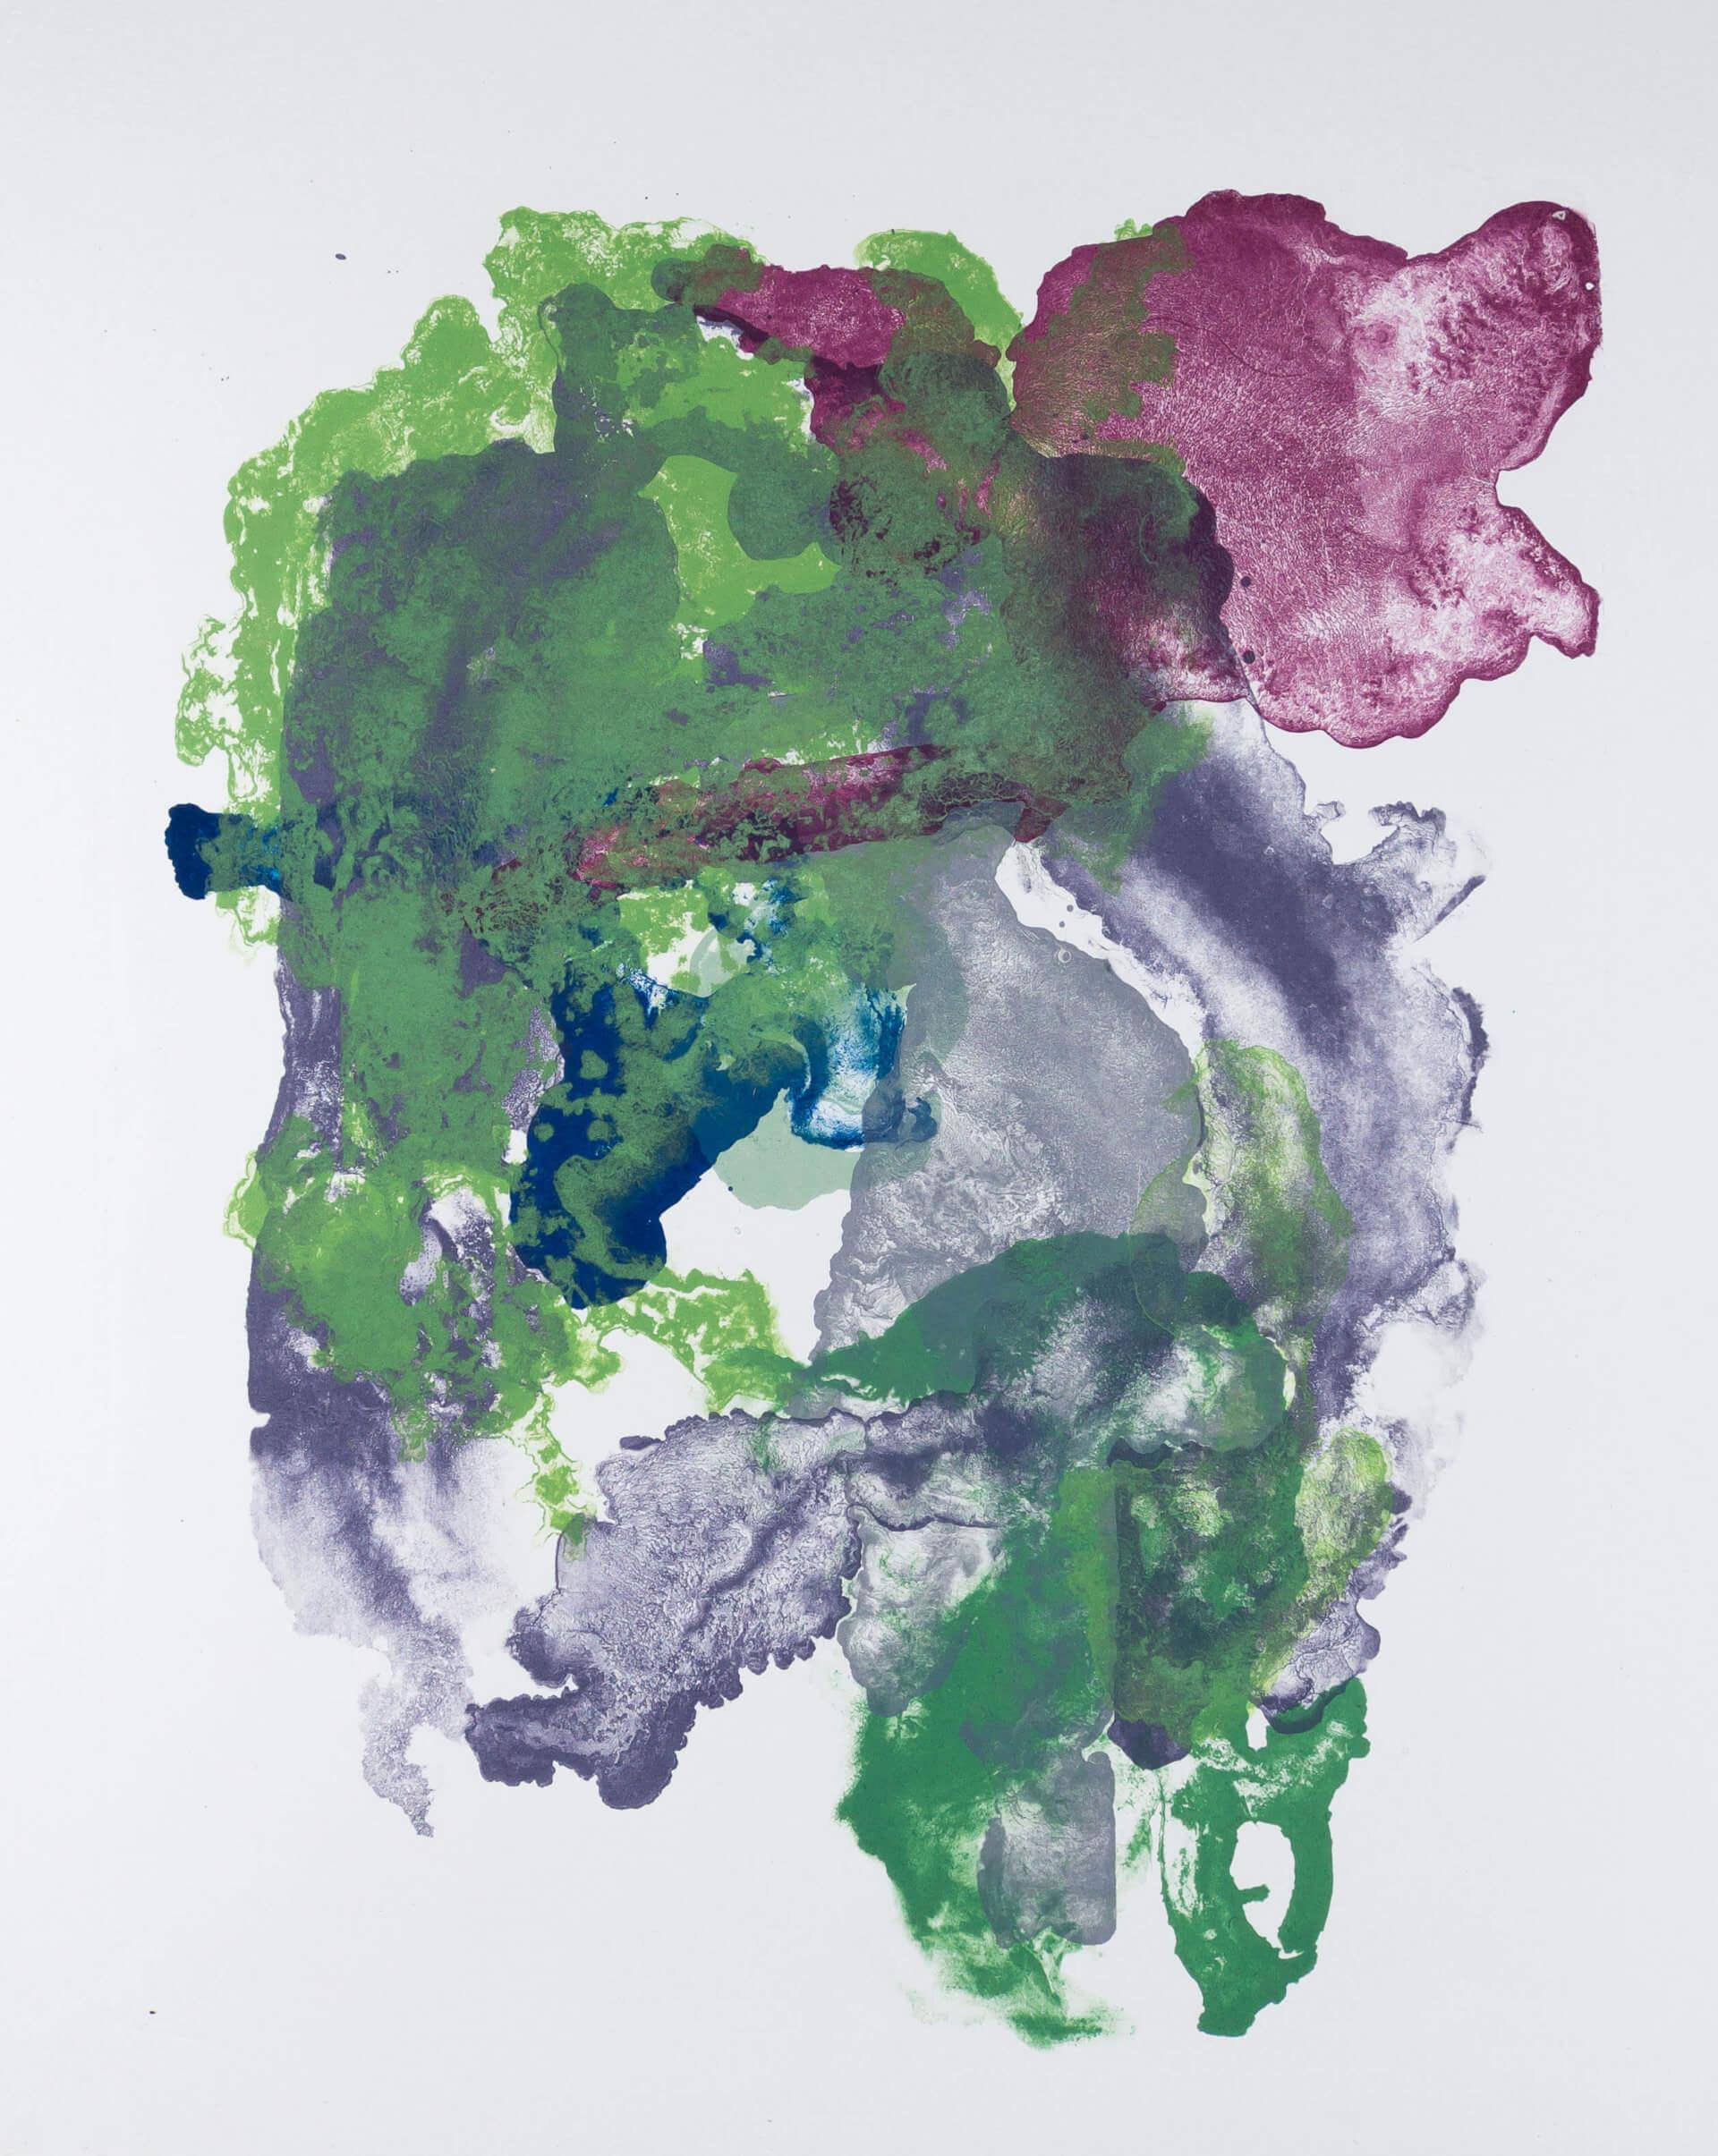 Katharina Albers, organism (growing)(G), 2017, Farblithographie, Unikat, 56x45 cm